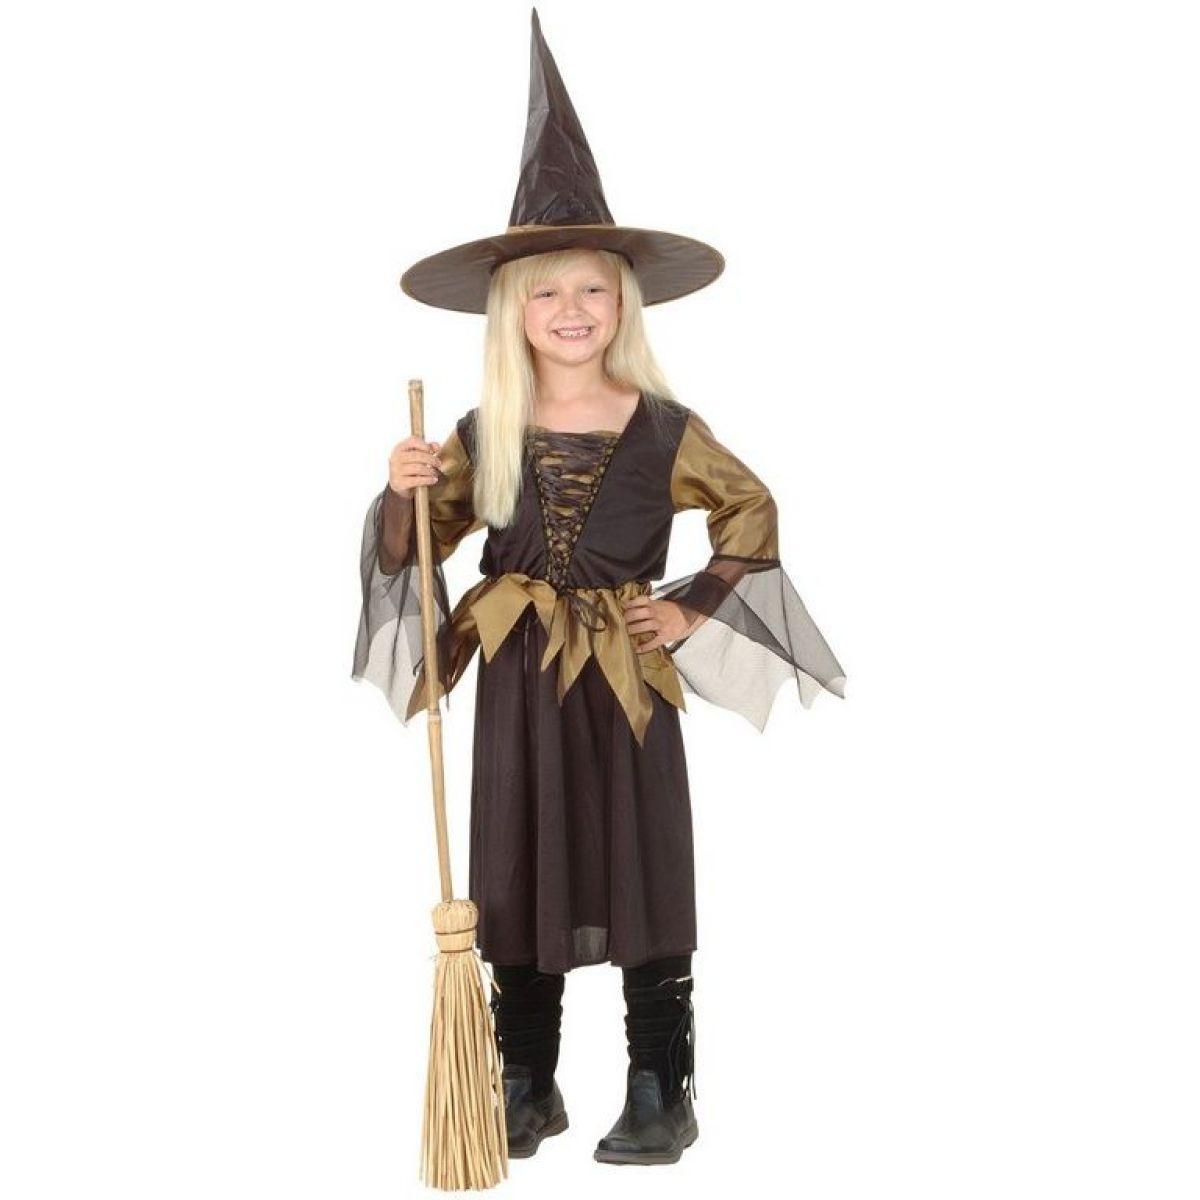 Made Dětský karnevalový kostým Čarodějnice 130-140 cm